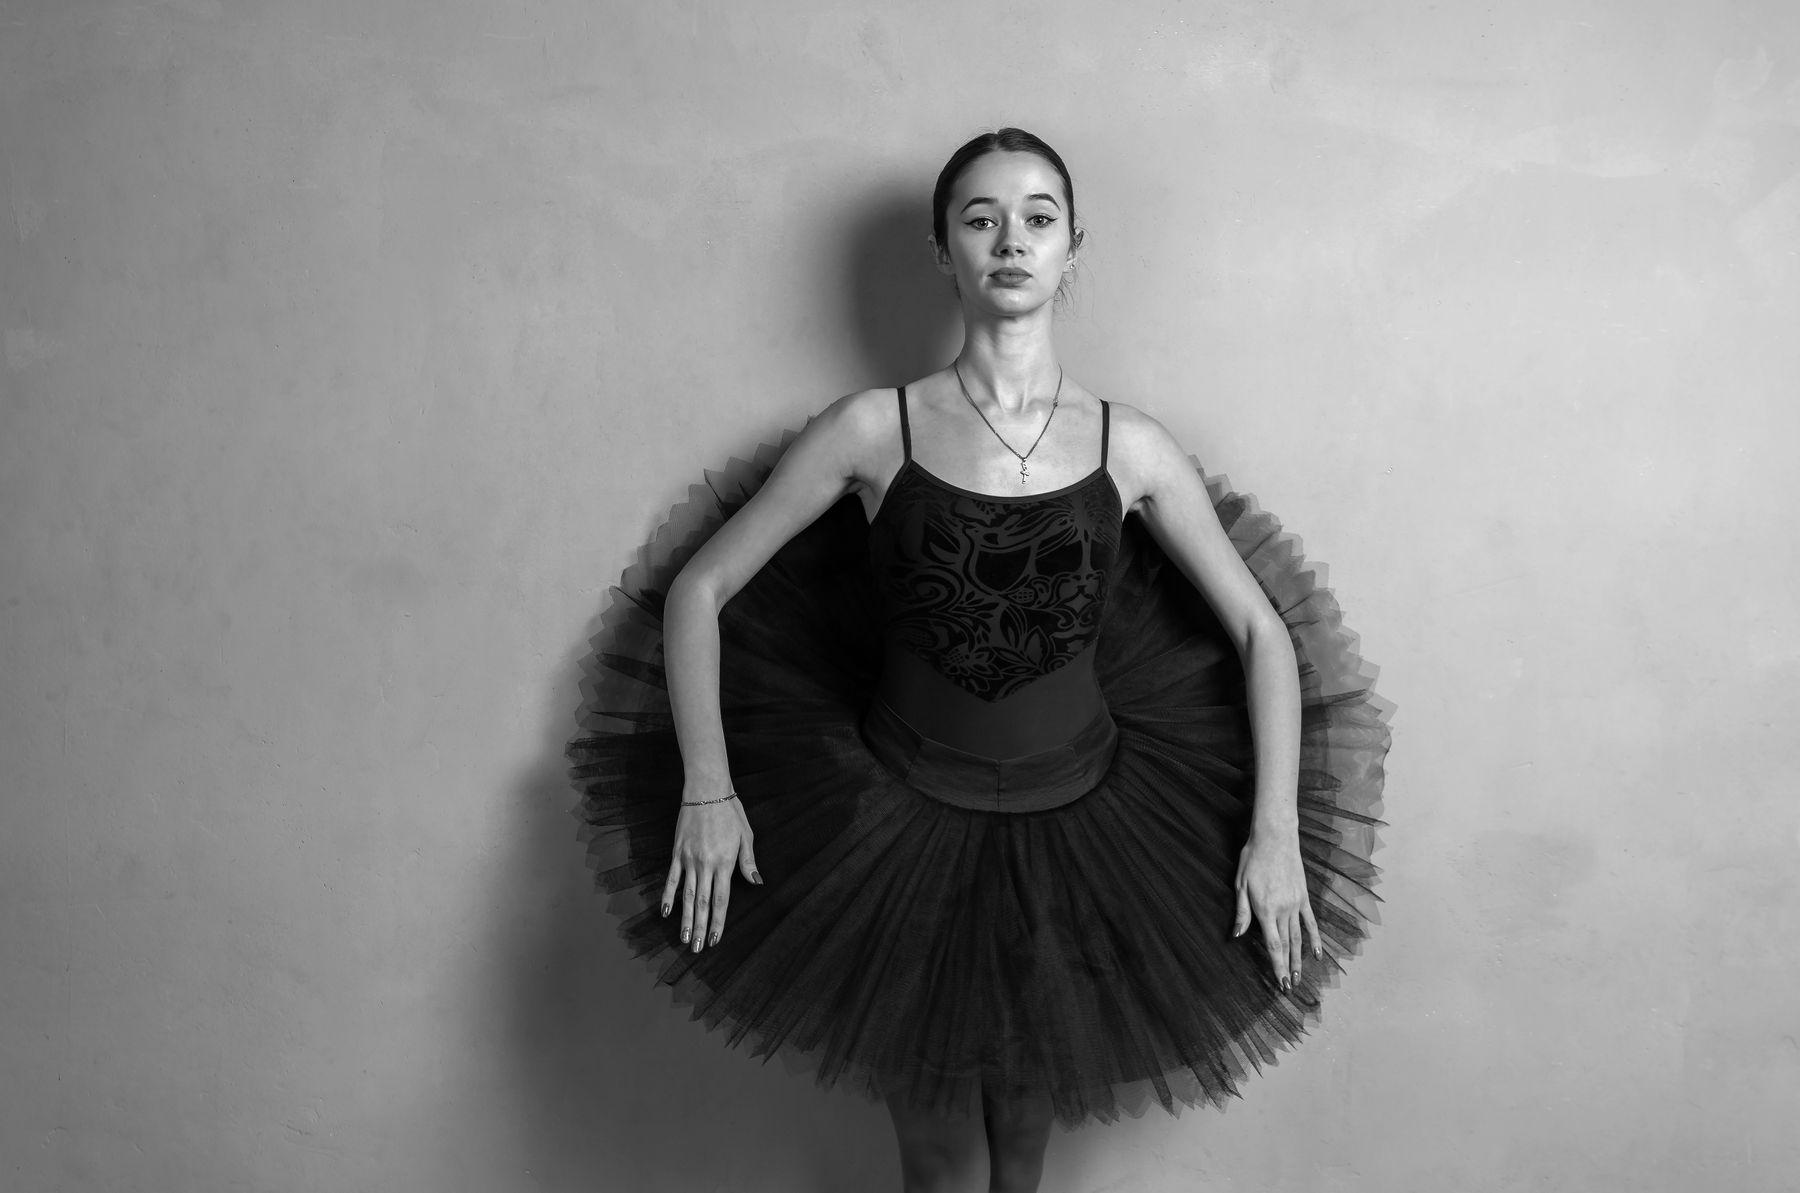 Александра балерина. балет танцы балерина студия свет черно-белое Ballet dancer art dance